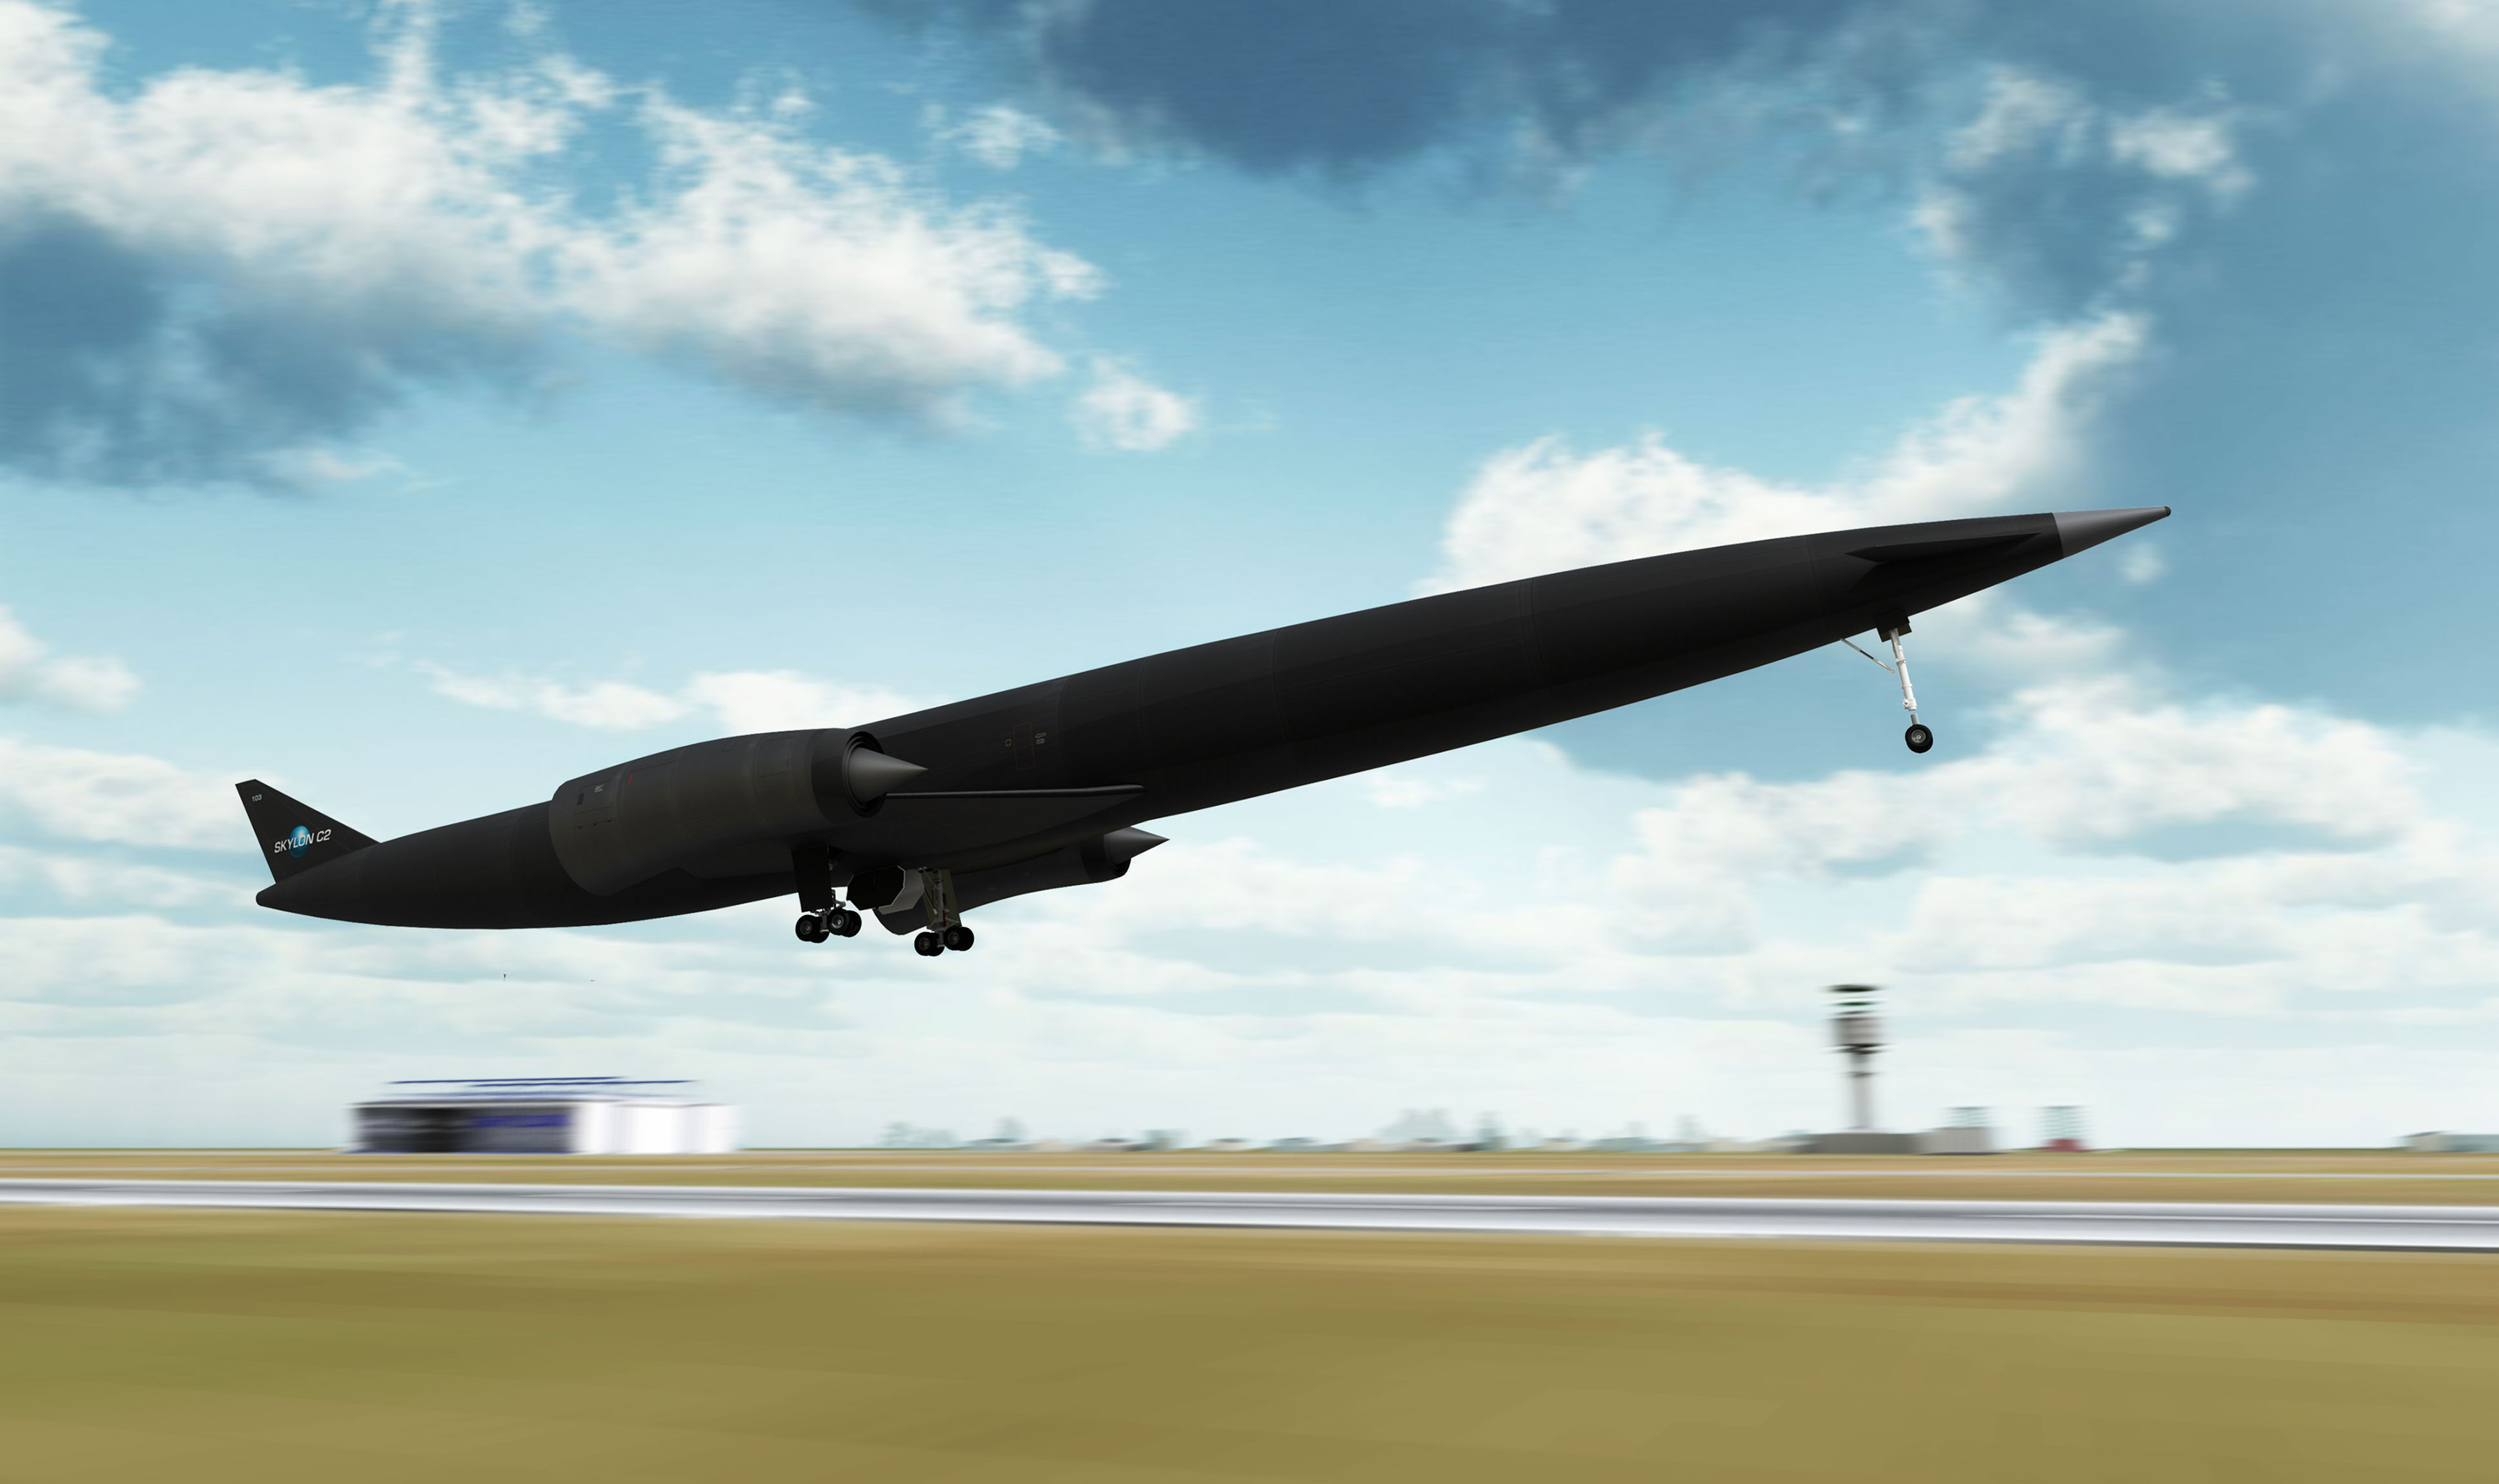 skylon_takeoff1l